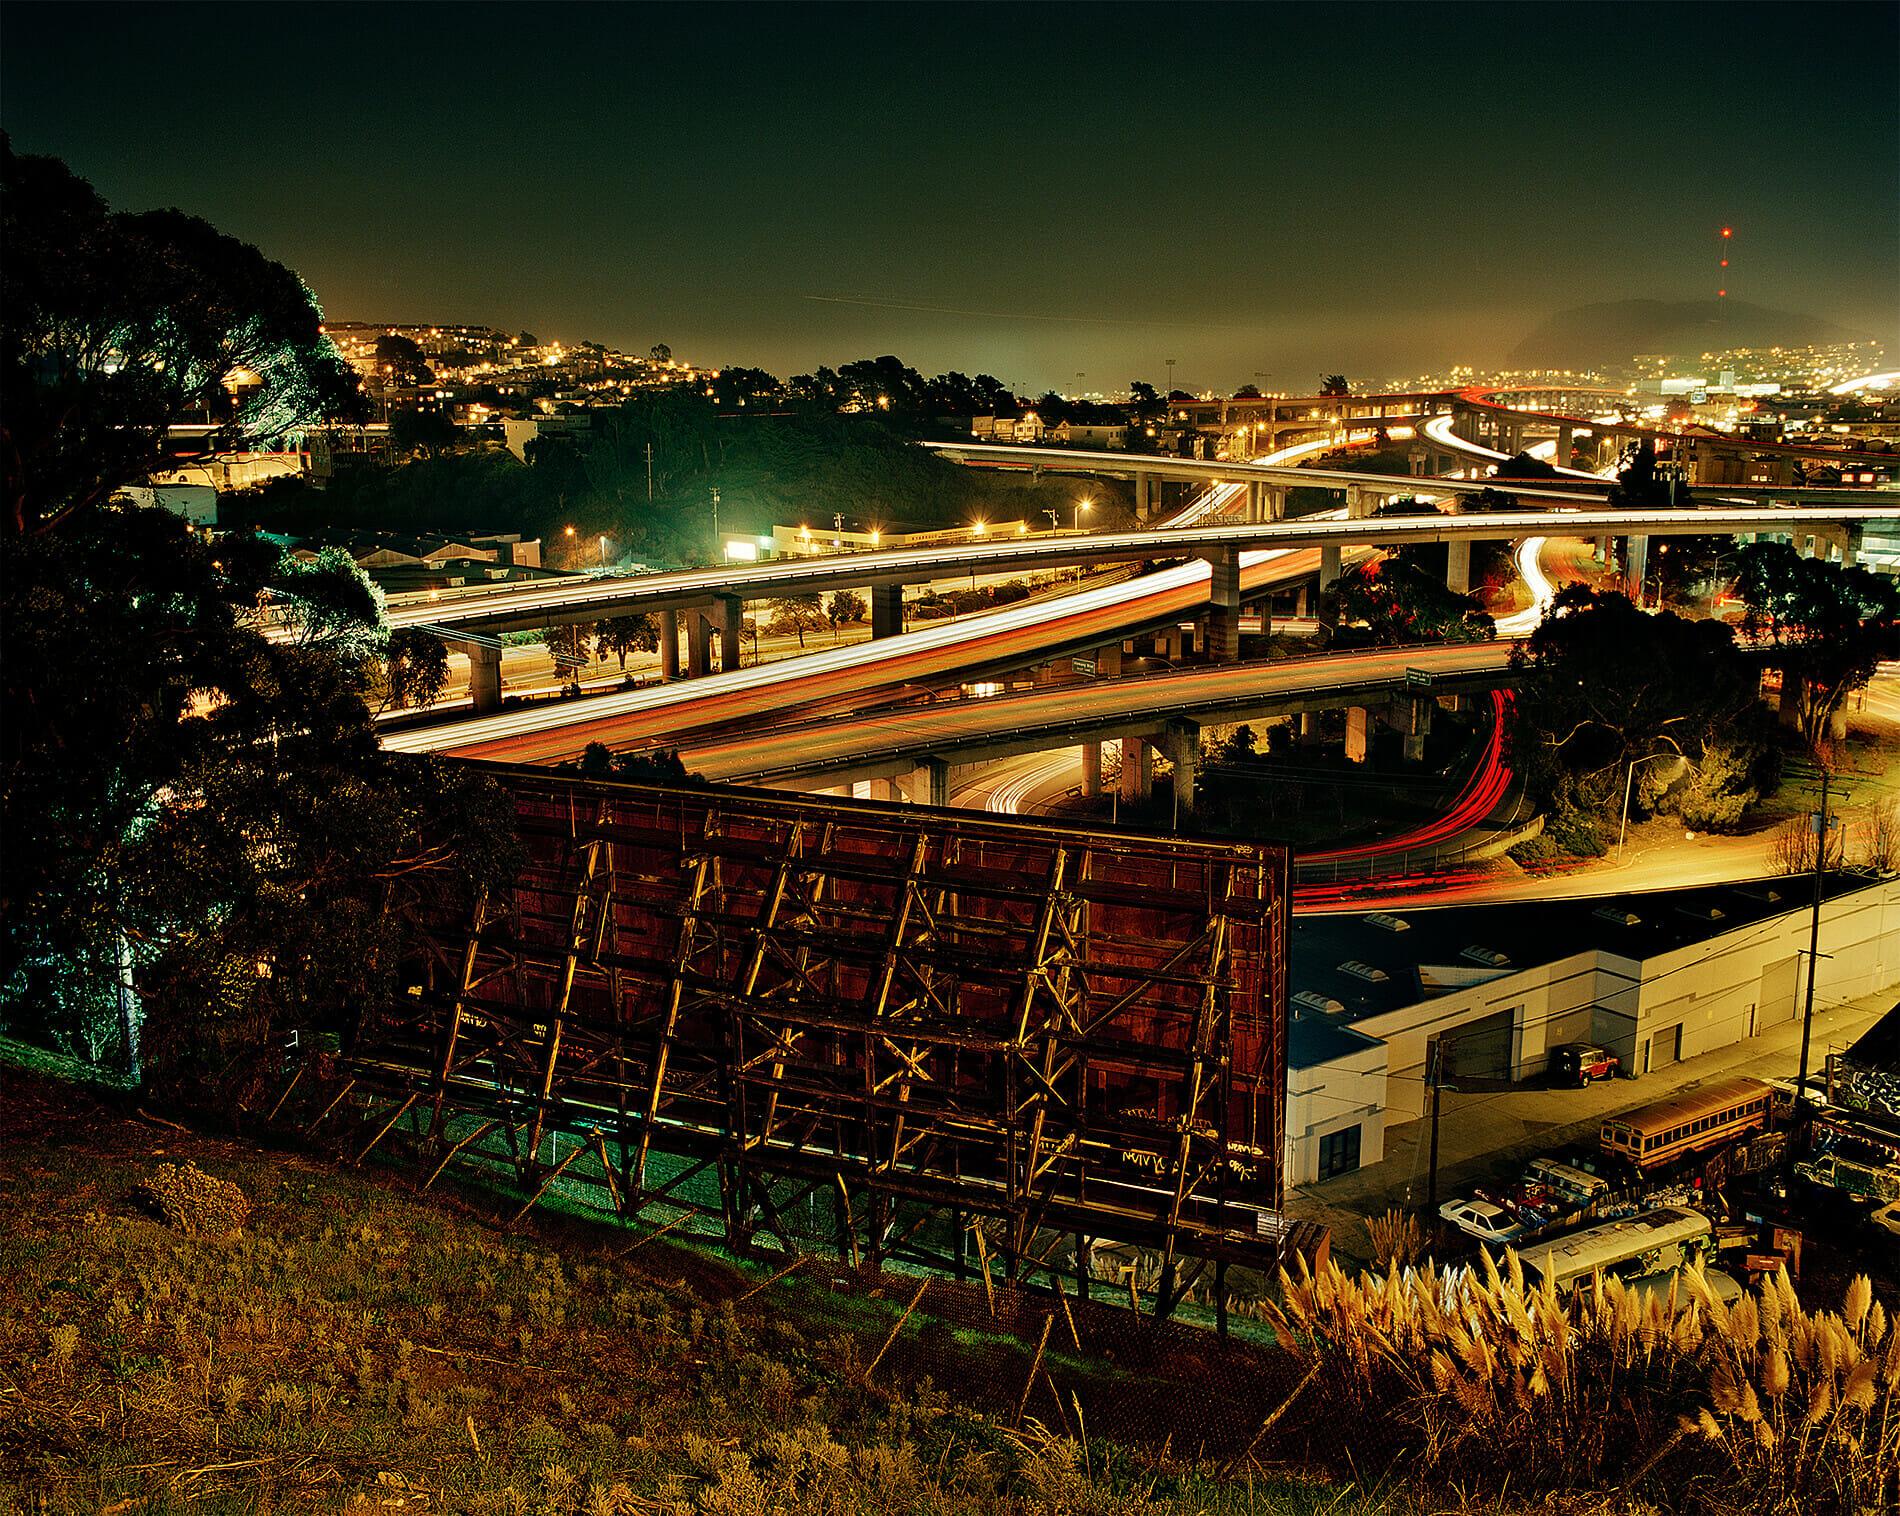 Billboard in San Francisco at night